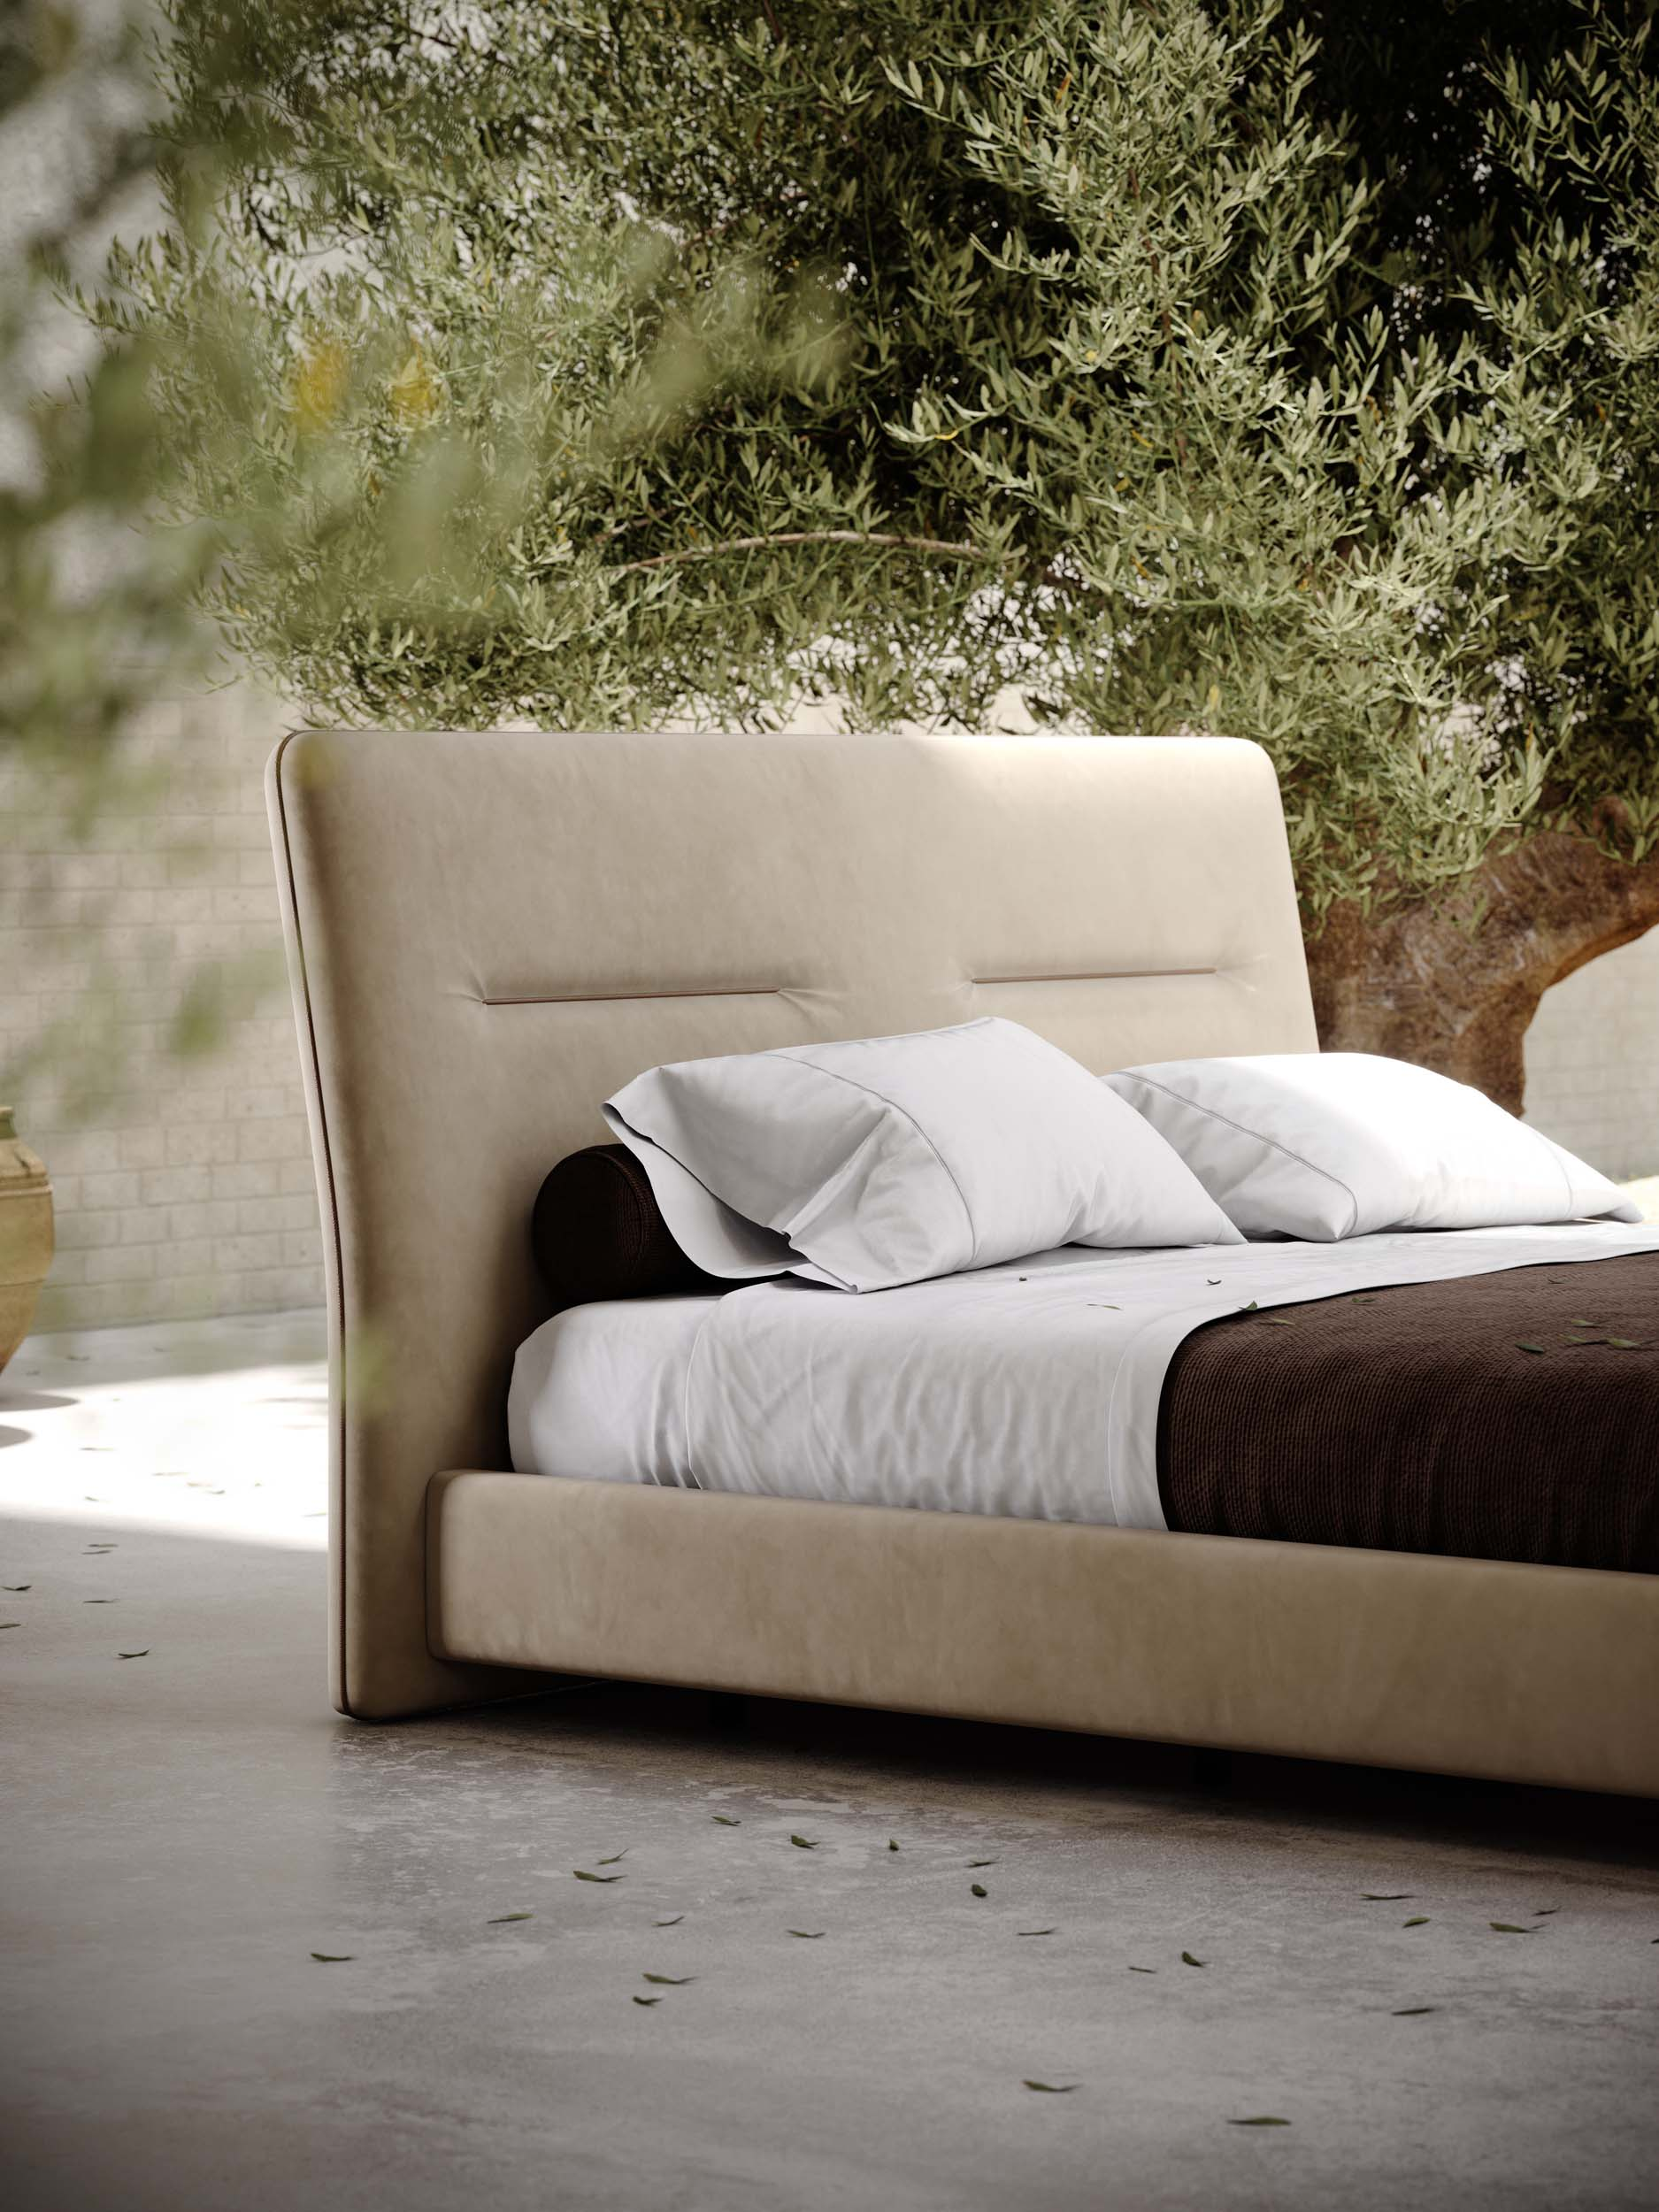 helen-bed-domkapa-new-2021-collection-bedroom-decor